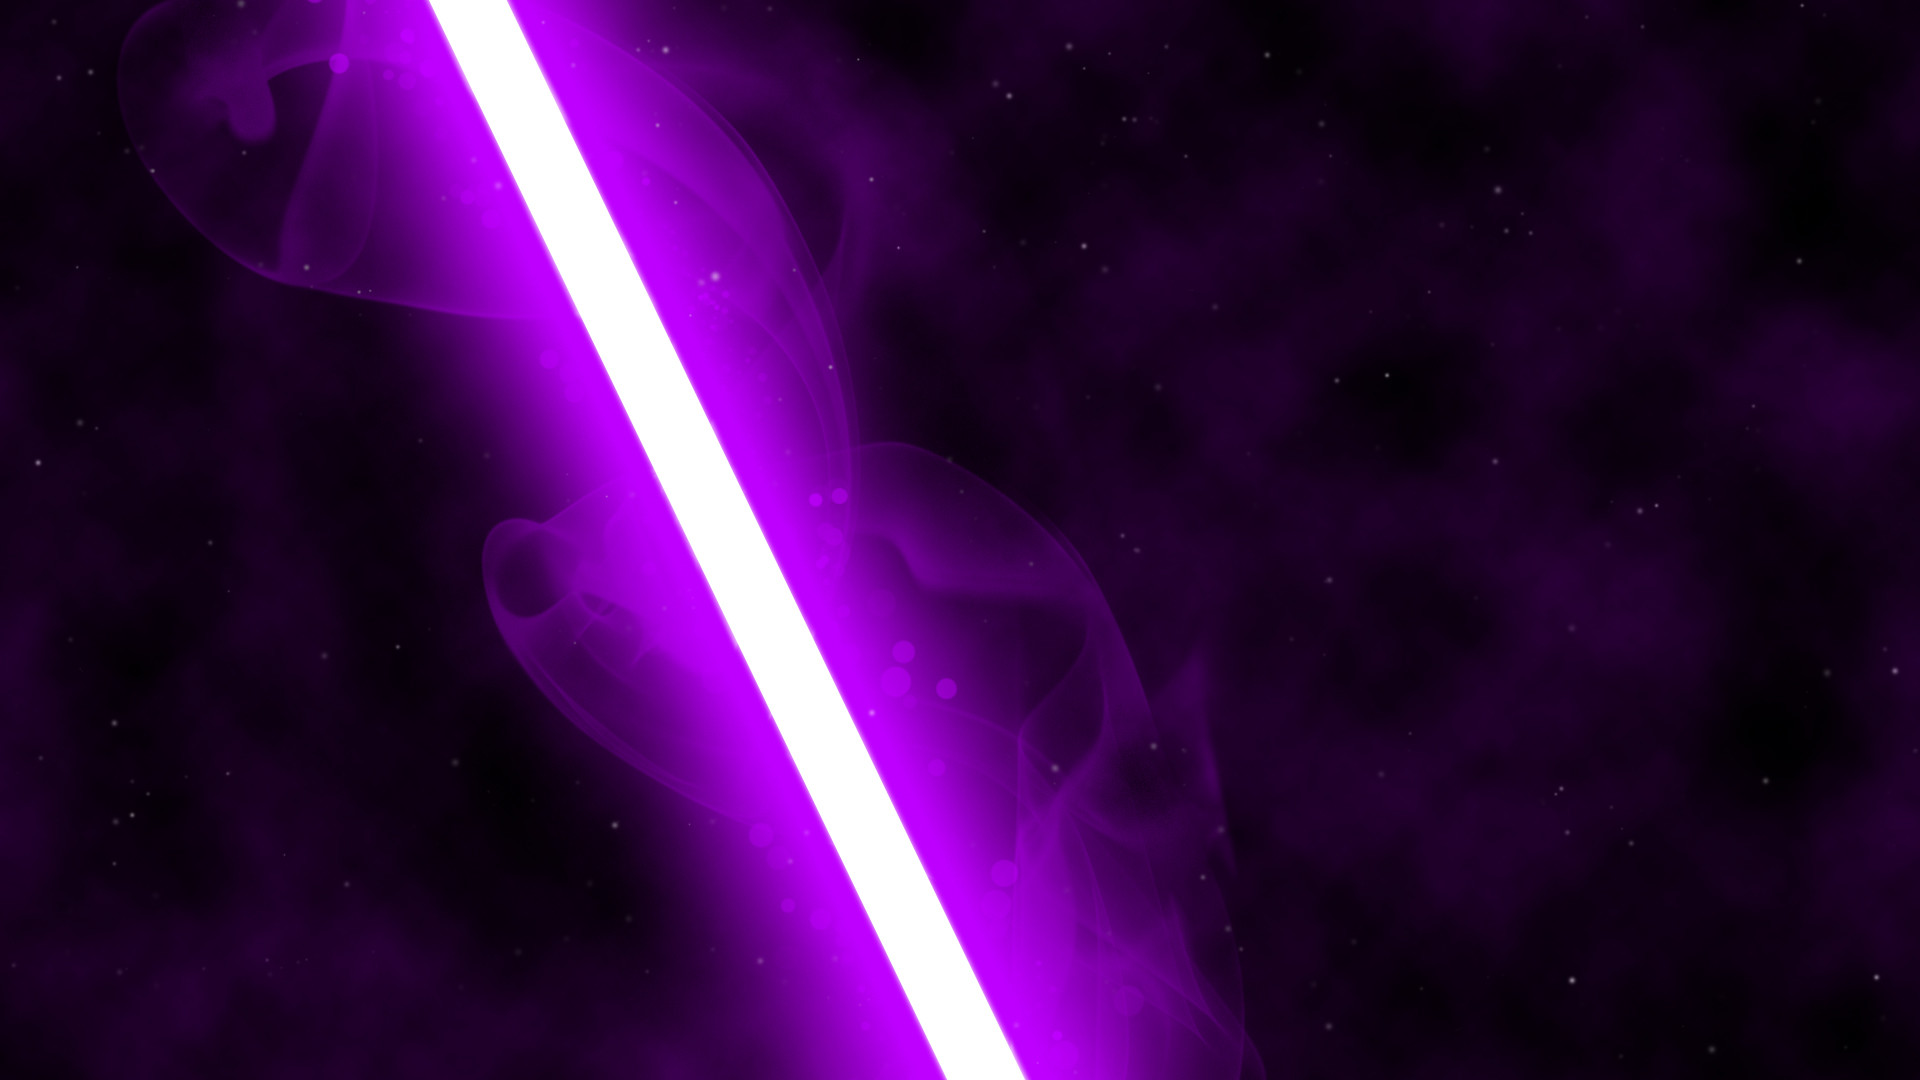 download Purple Lightsaber Wallpaper 76 images [1920x1080 1920x1080